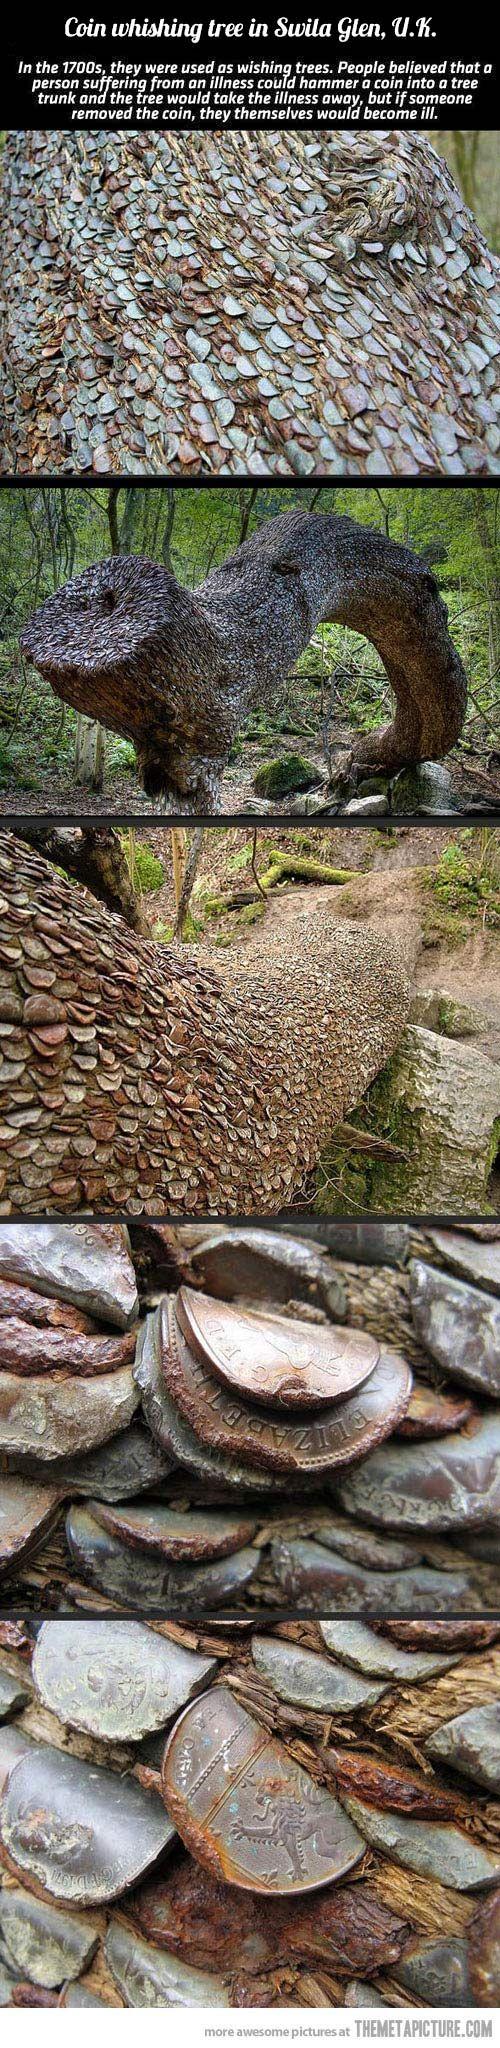 Coin wishing trees…